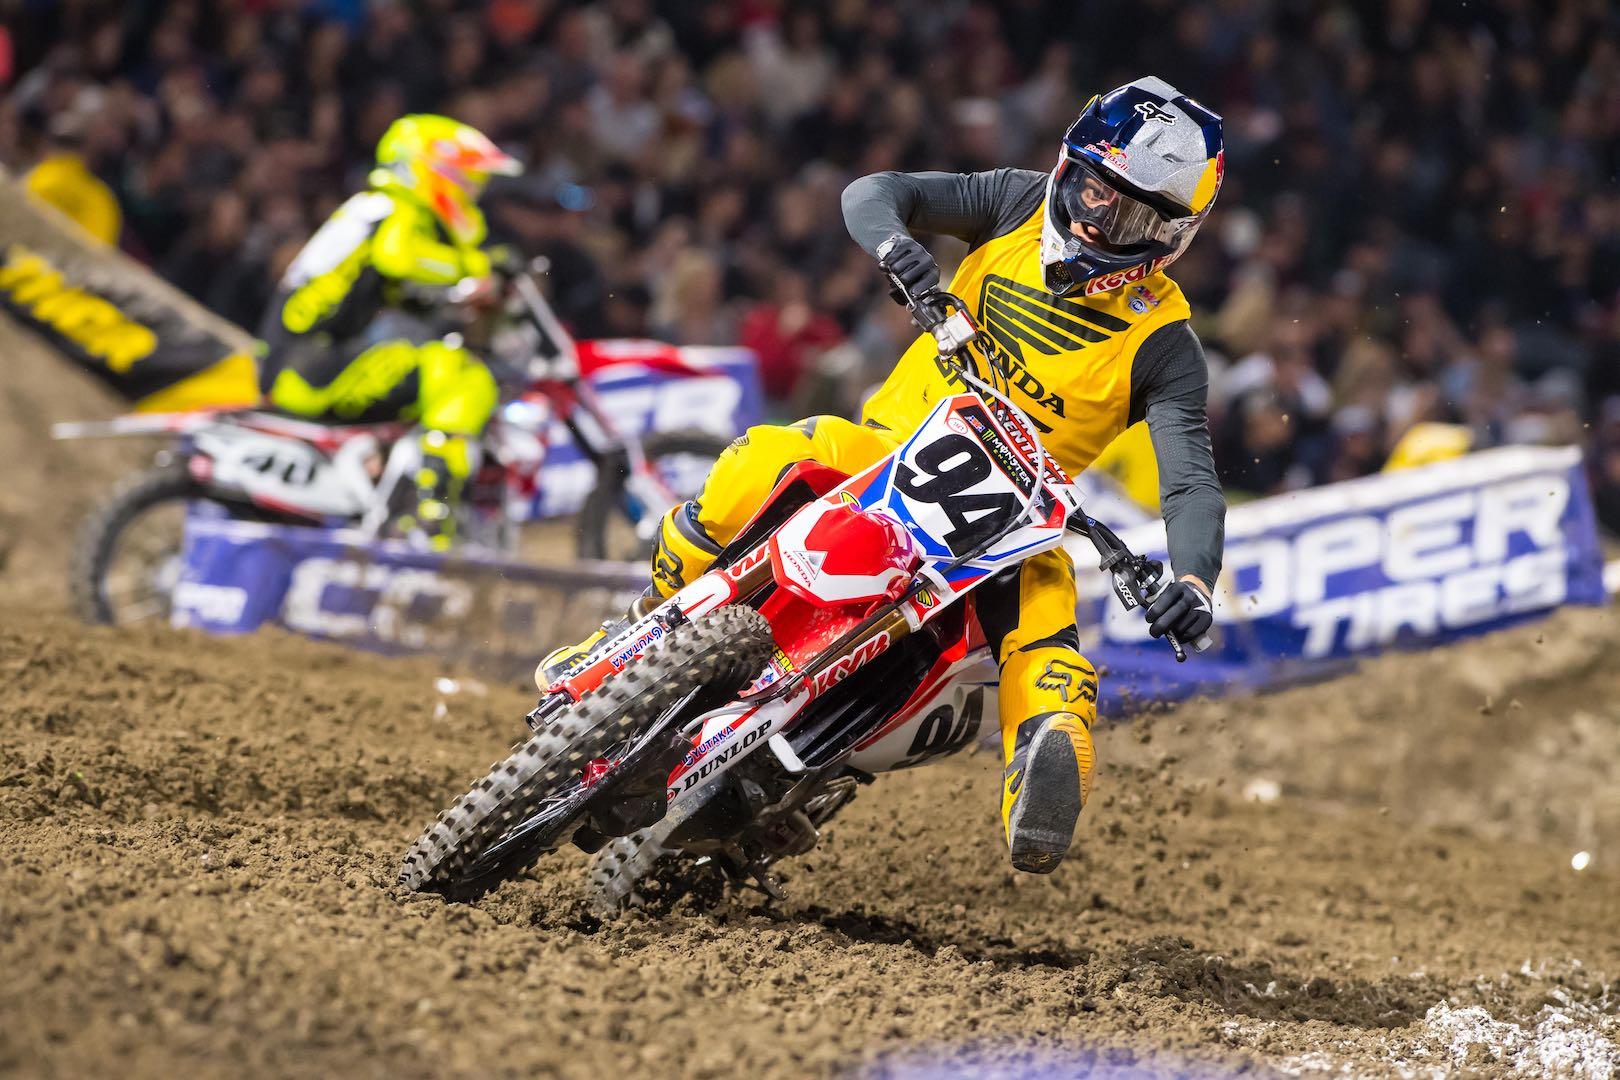 Honda's Ken Roczen leads into San Diego Supercross